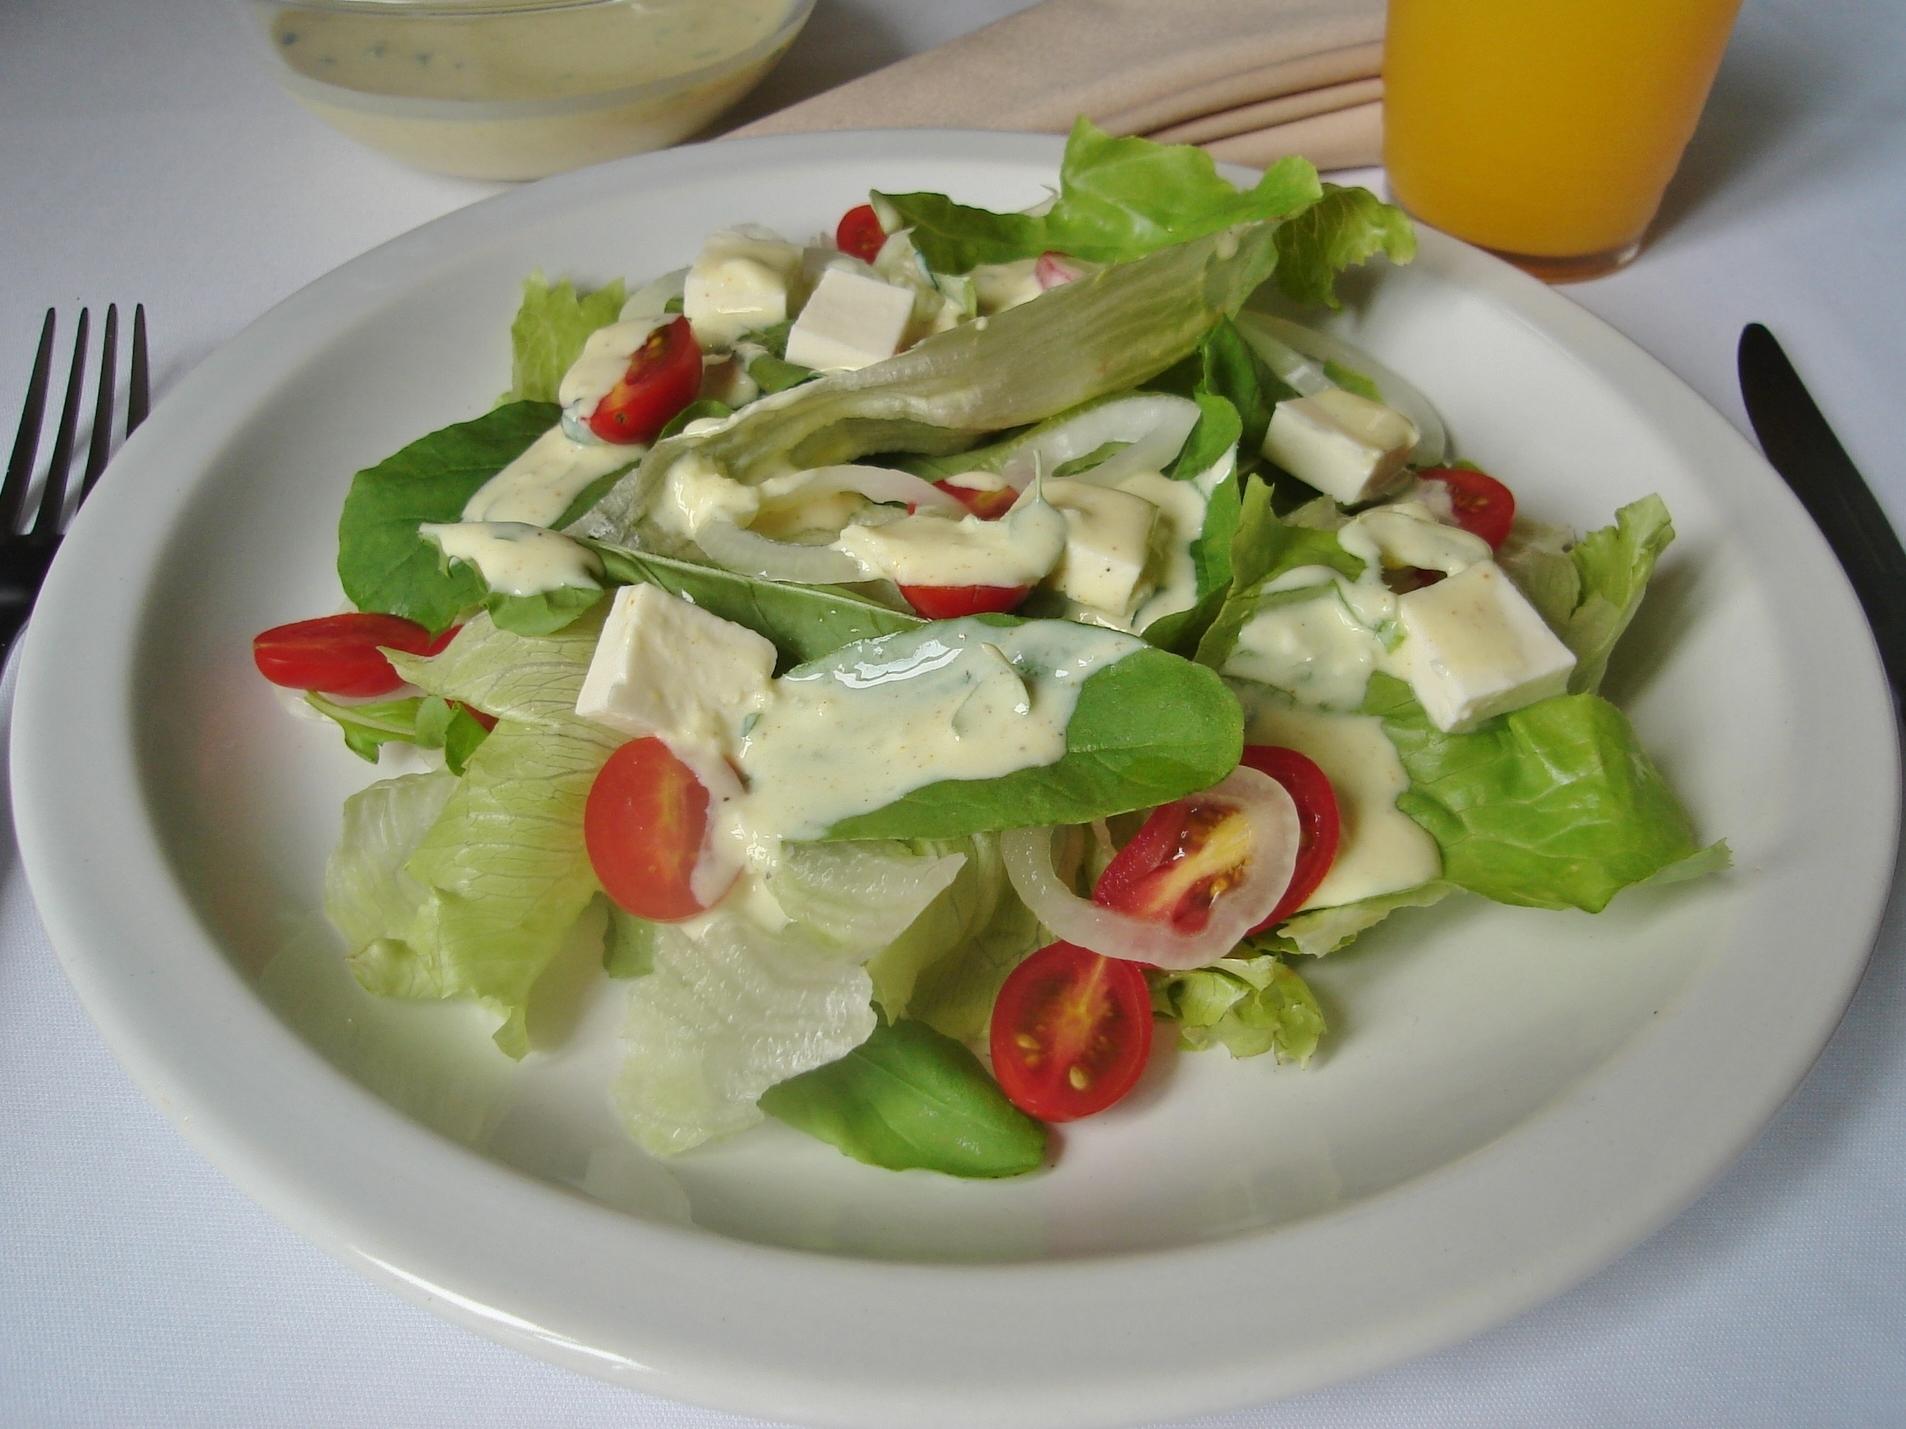 de molho branco para salada verde